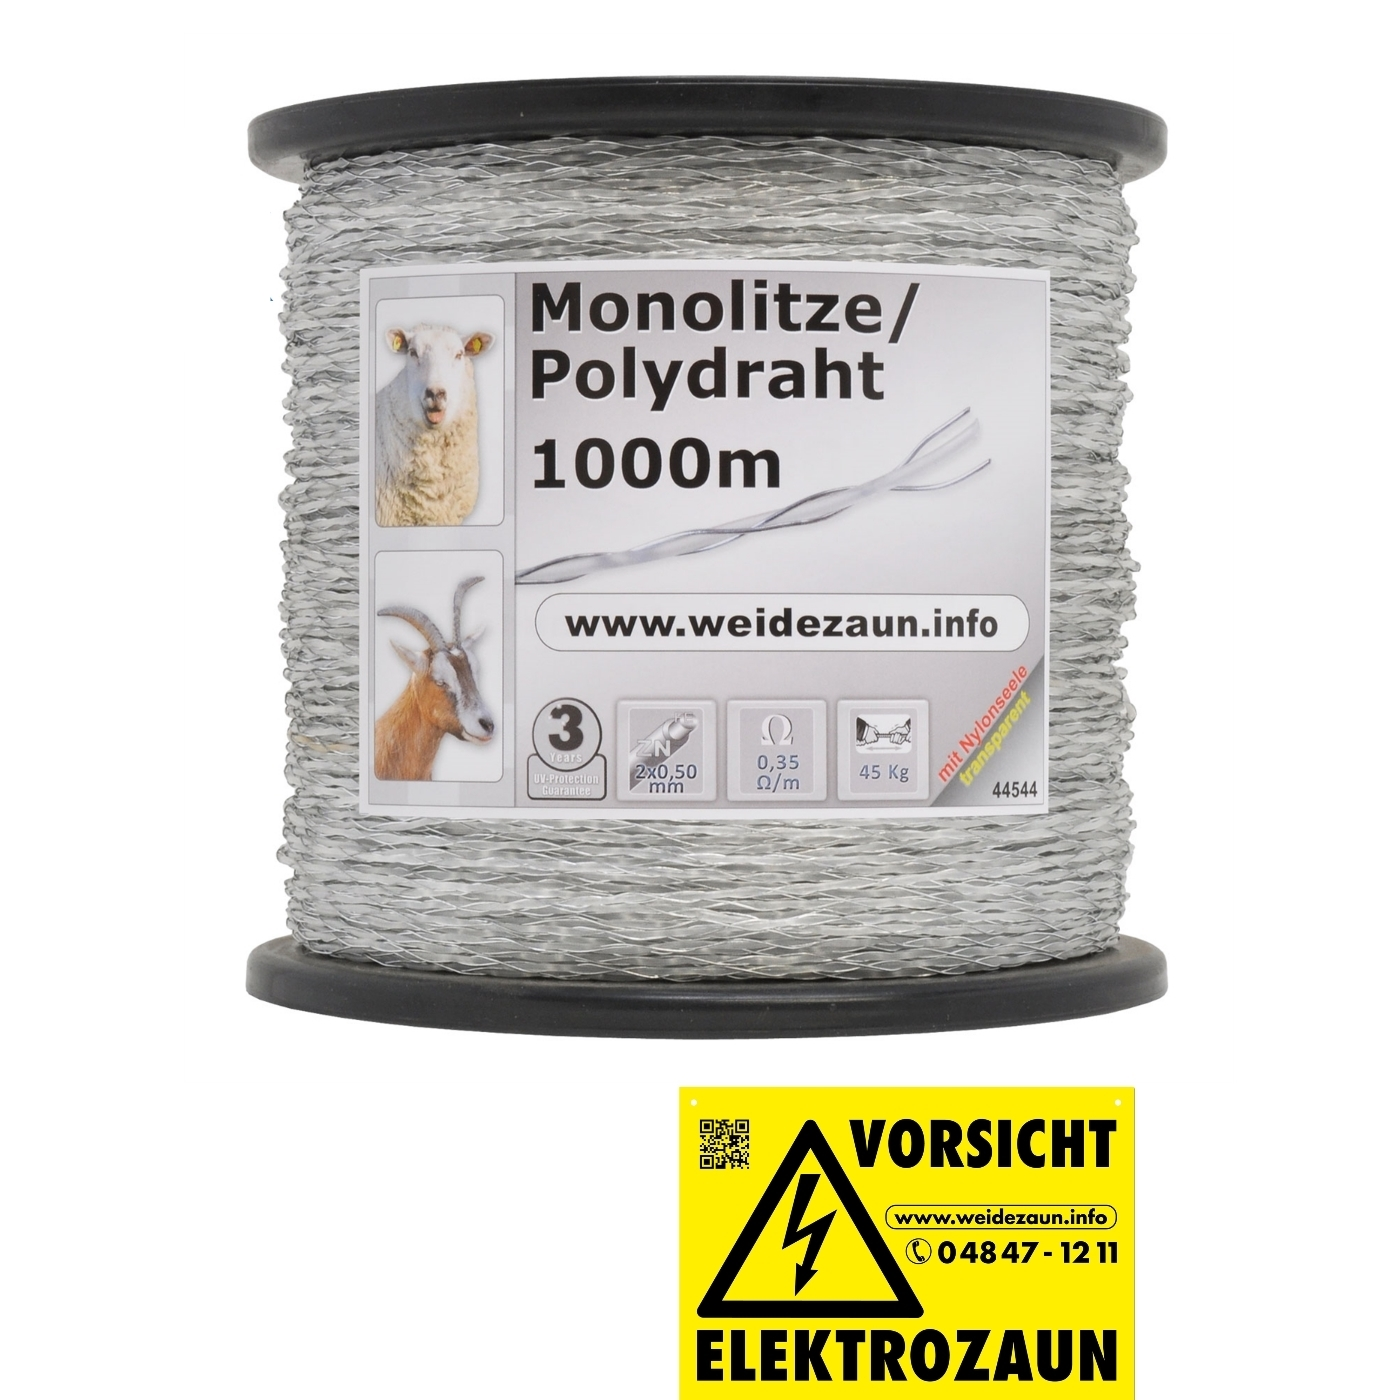 Atemberaubend Elektrozaun Schaltplan Ideen - Schaltplan Serie ...